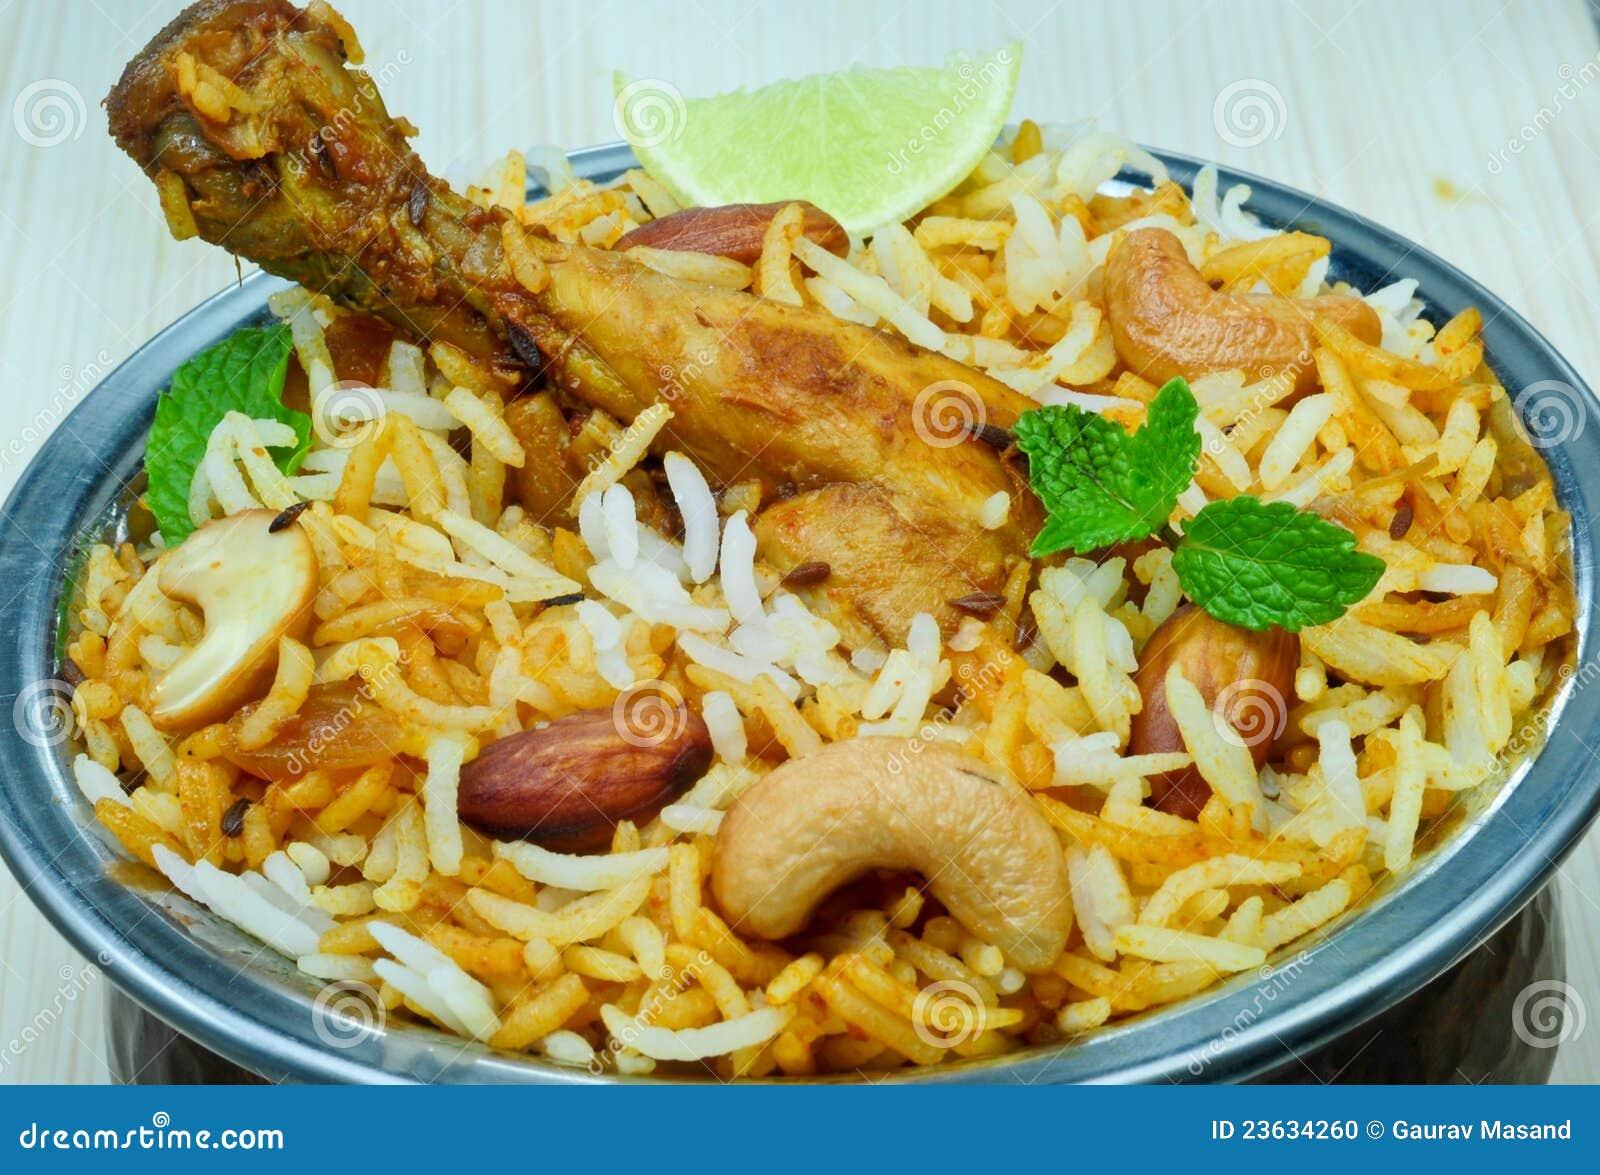 Free stock photo of asian food, biryani, biryani plate.